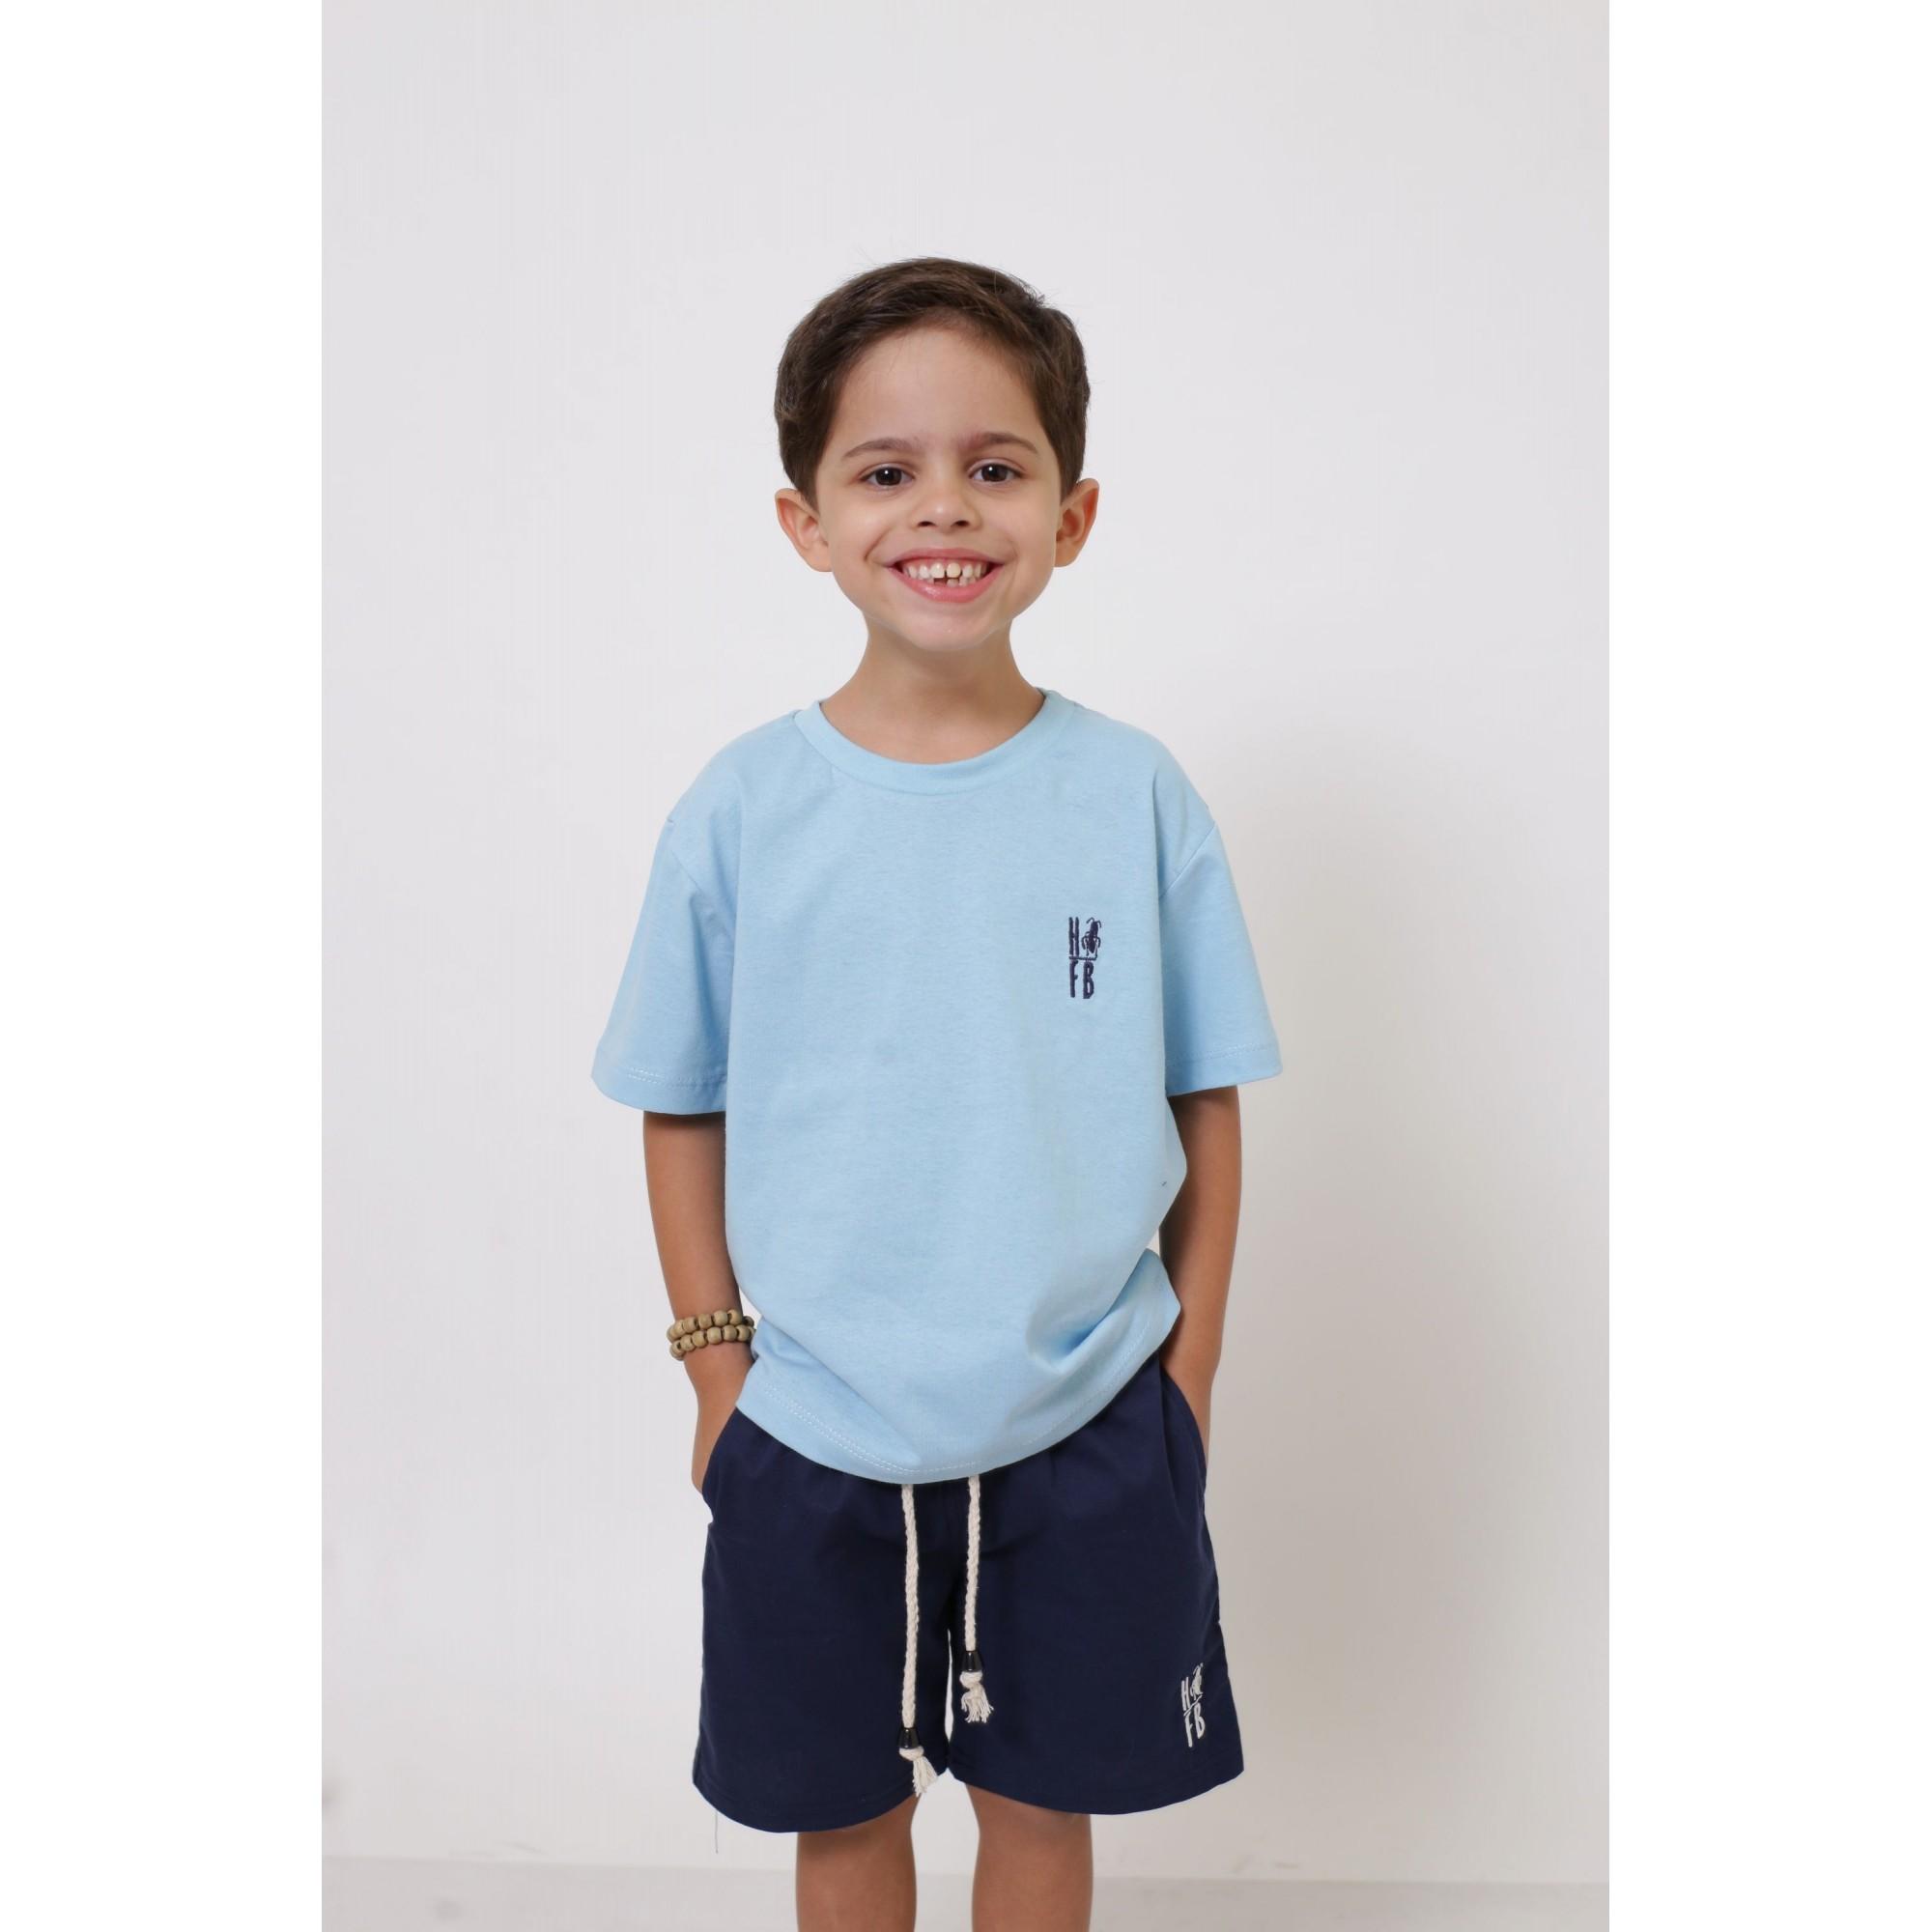 Camiseta ou Body Infantil Unissex - Azul Bebê  - Heitor Fashion Brazil